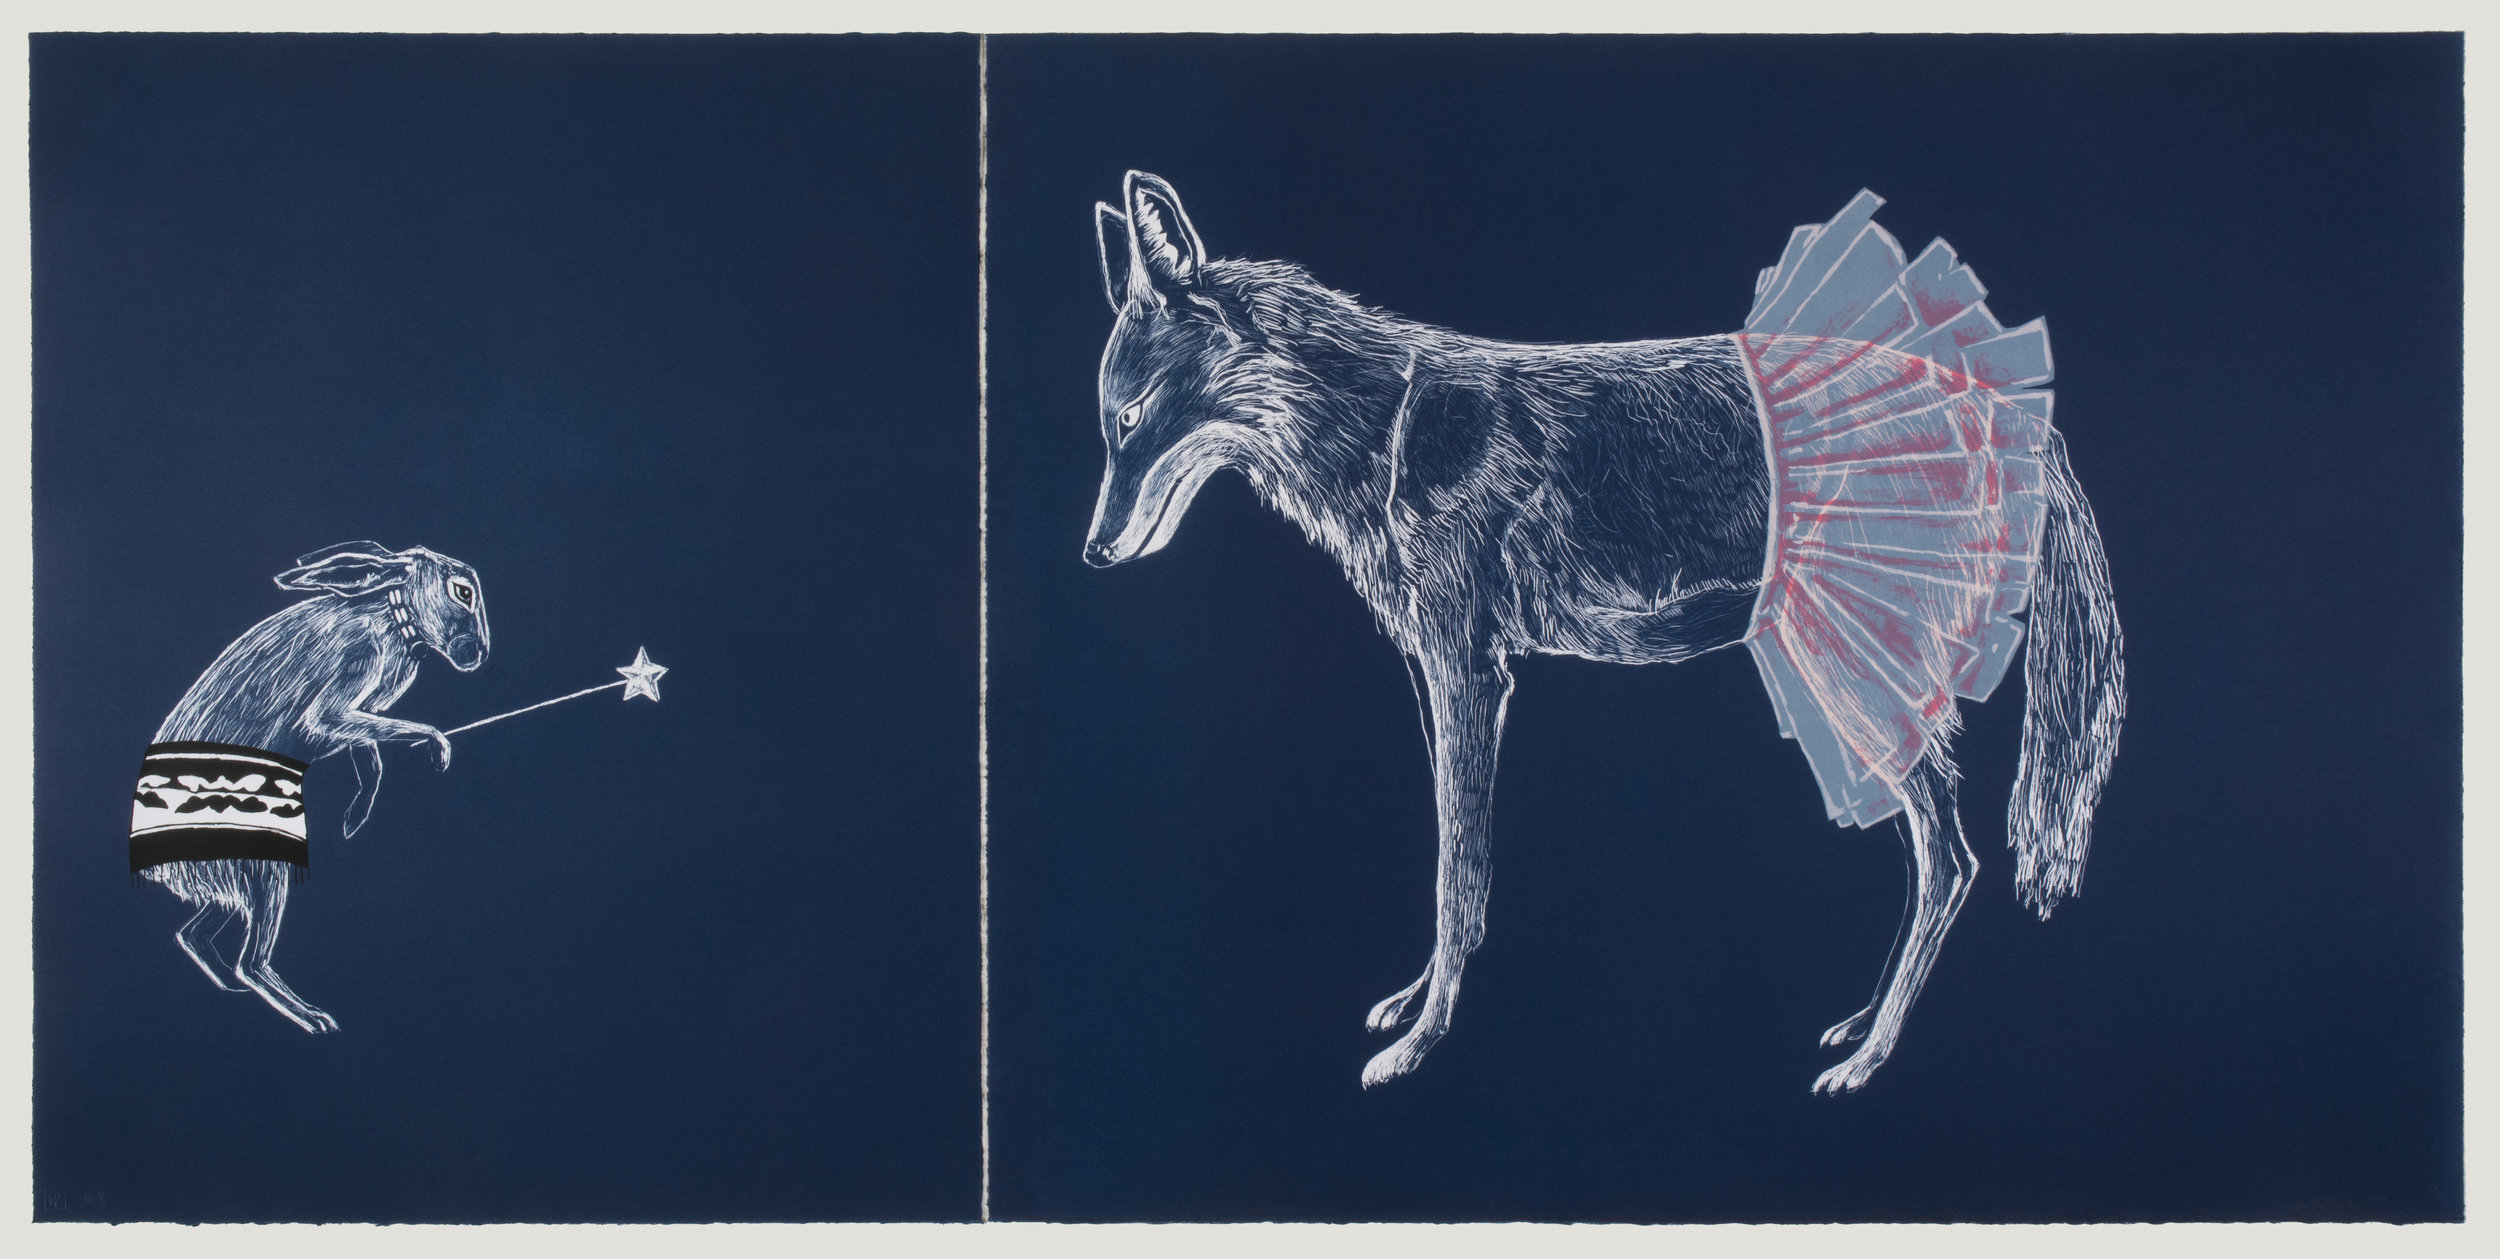 """The Trickster Showdown"" by Julie Buffalohead 2015 Edition of 8 | Lithograph & Screenprinting | 27 1/2"" x 56"""